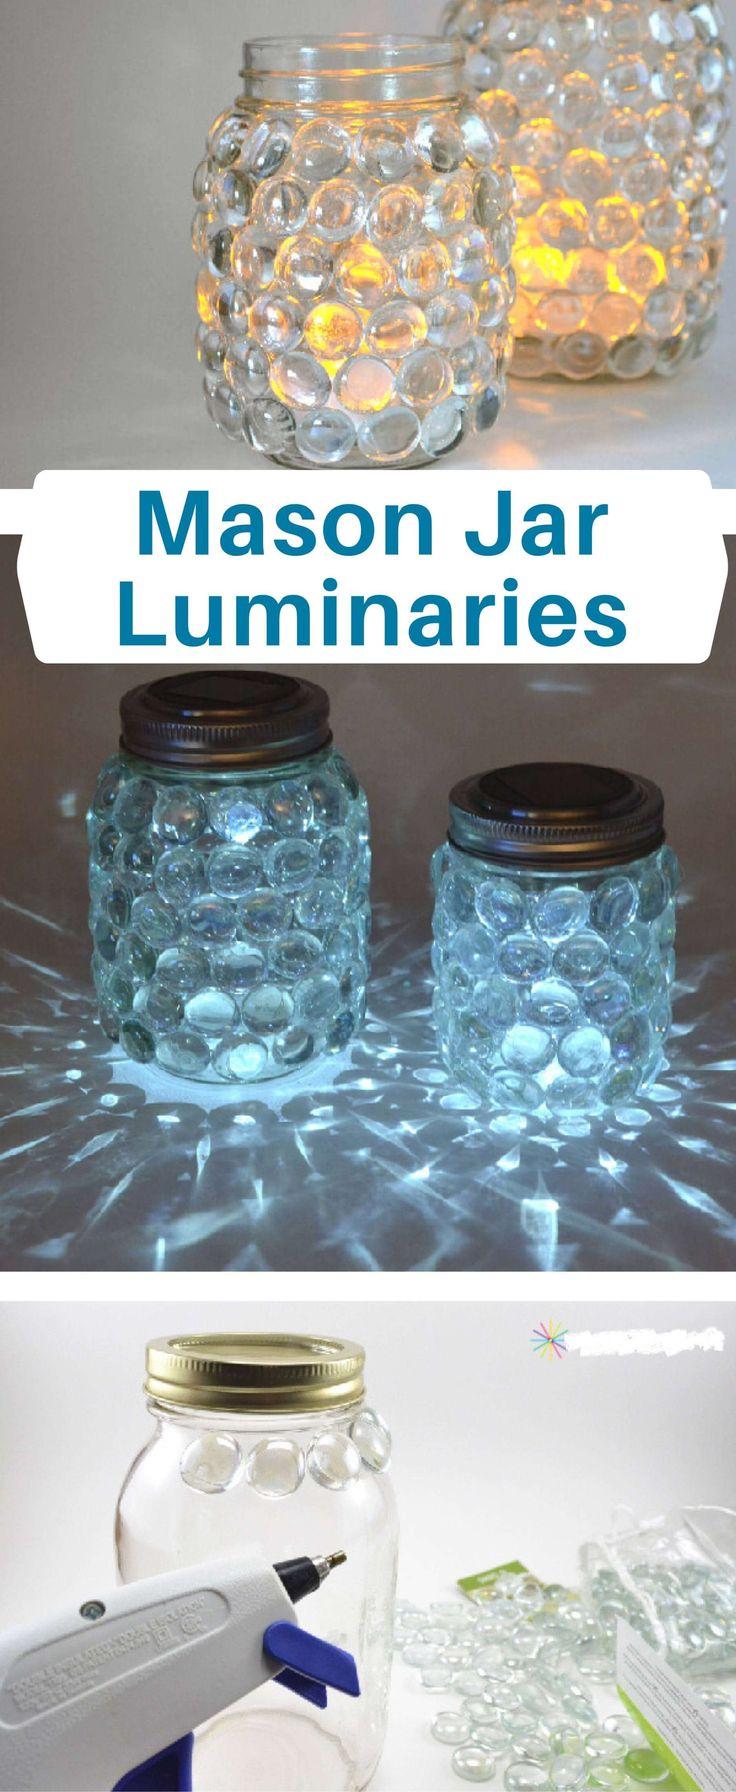 Mason Jar Luminaries Tutorial